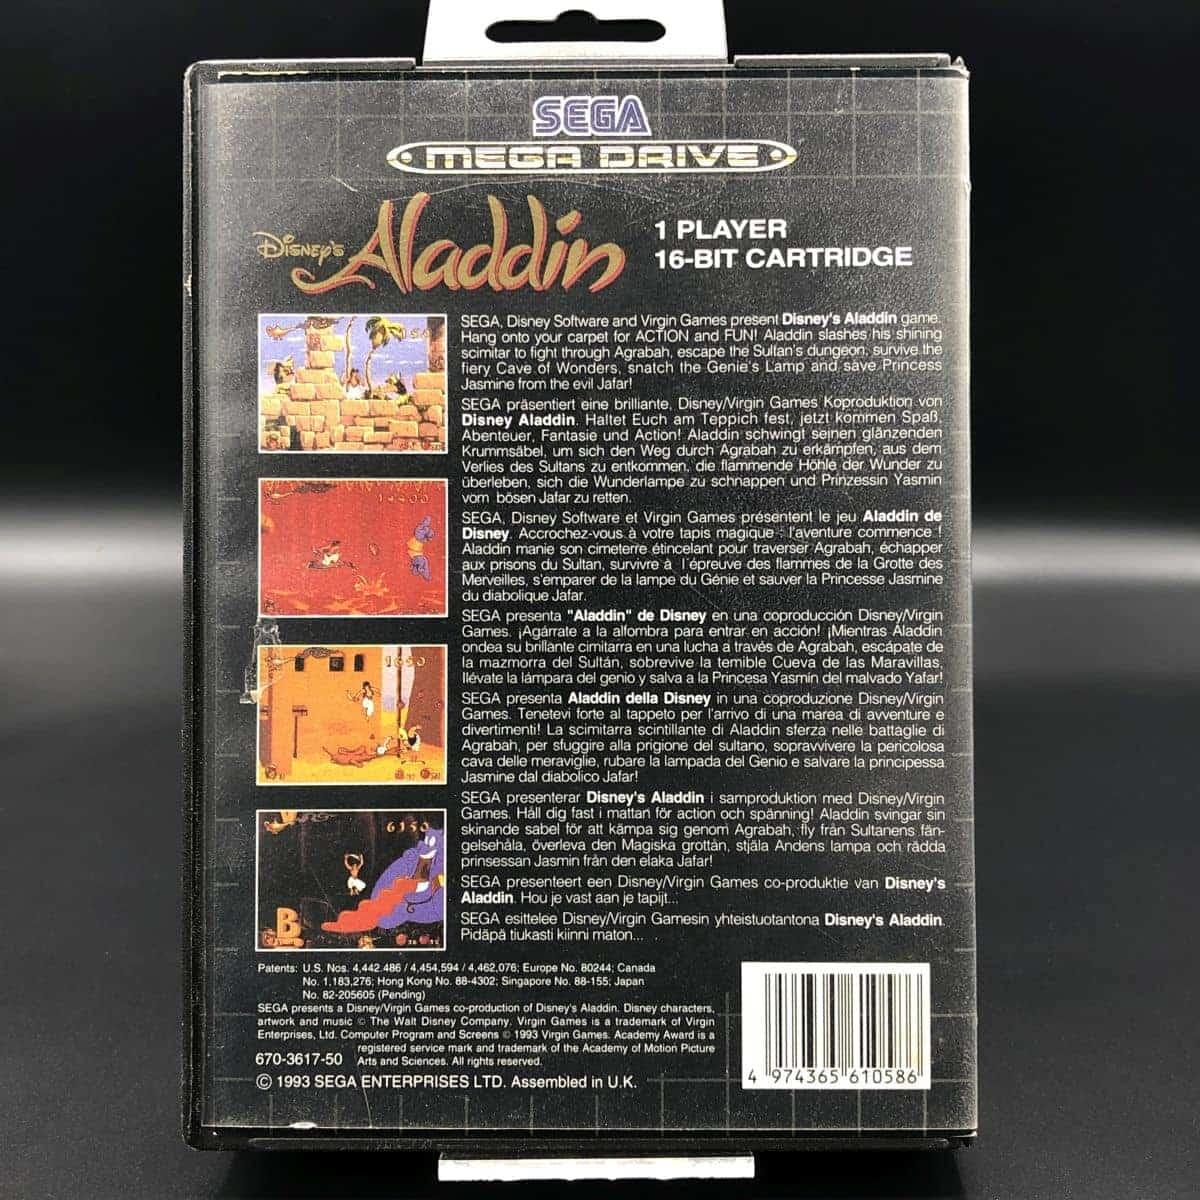 Disney's Aladdin (Komplett) (Sehr gut) Sega Mega Drive